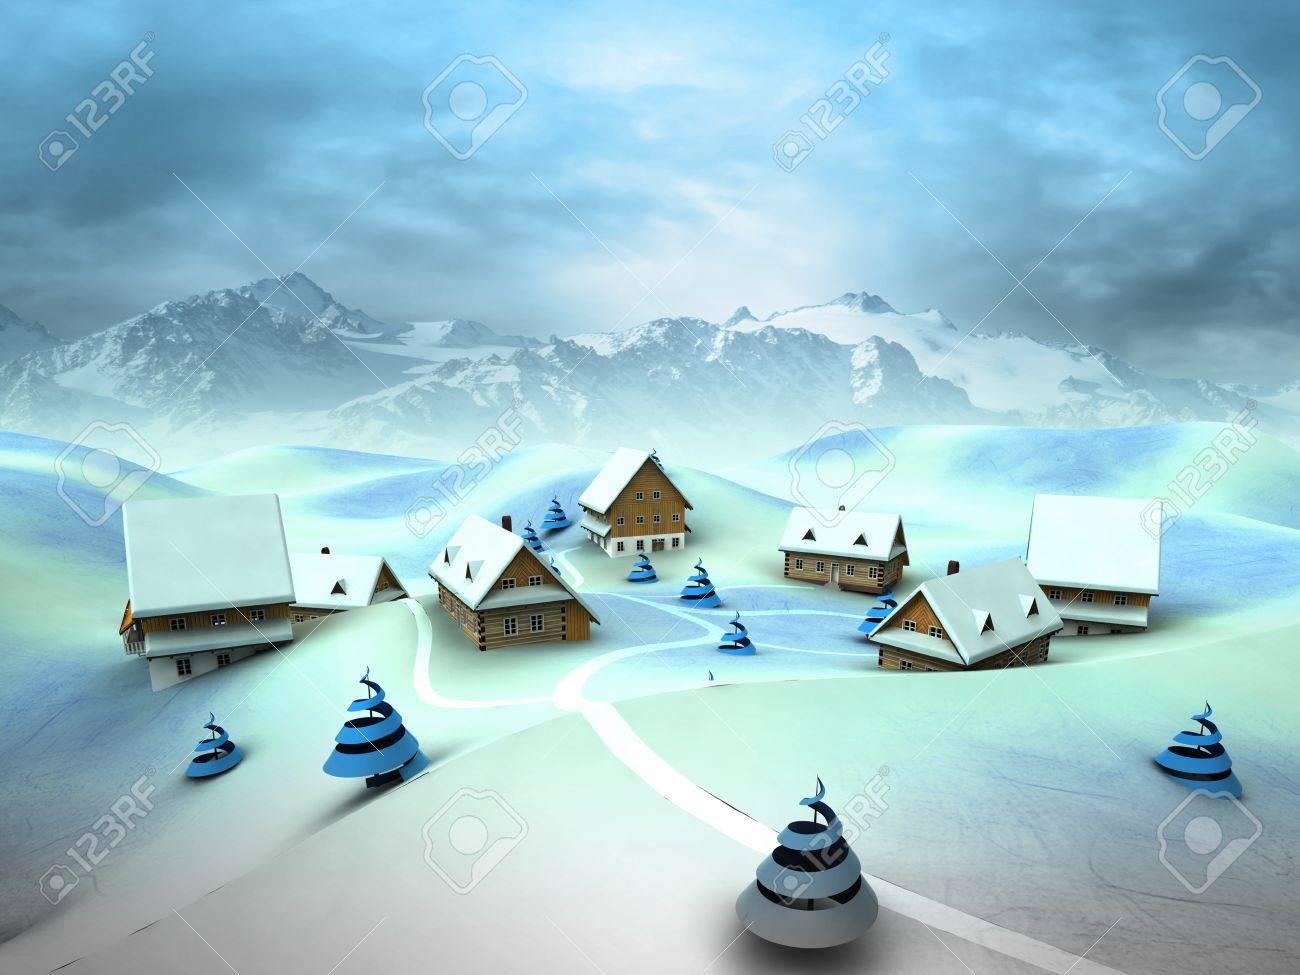 Winter village scene with high mountain landscape illustration Stock Photo - 17351547